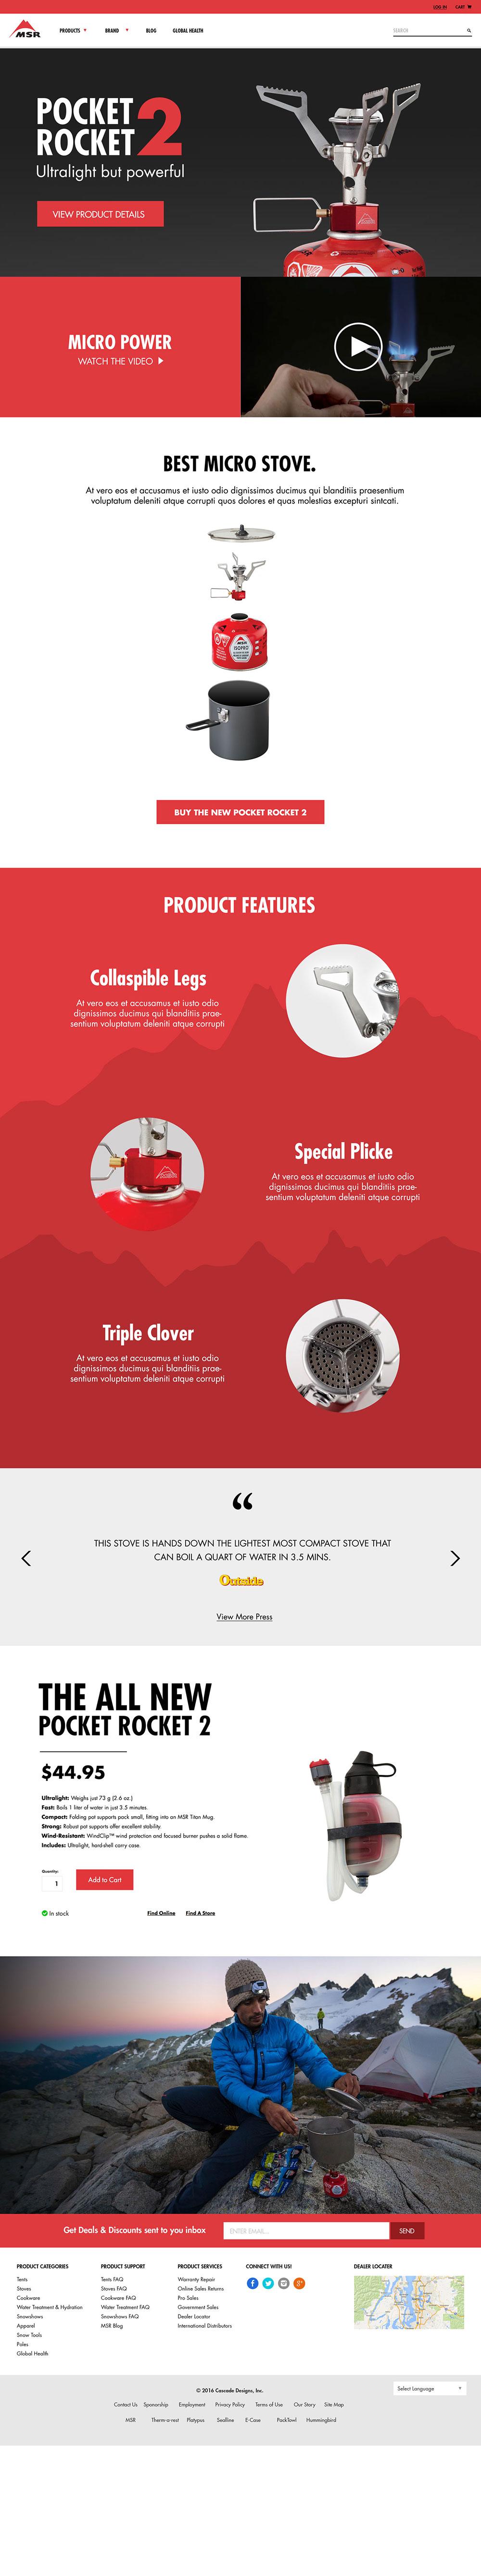 MSR Featured Product Page Web Design | Pure Design Group Seattle Web Designer